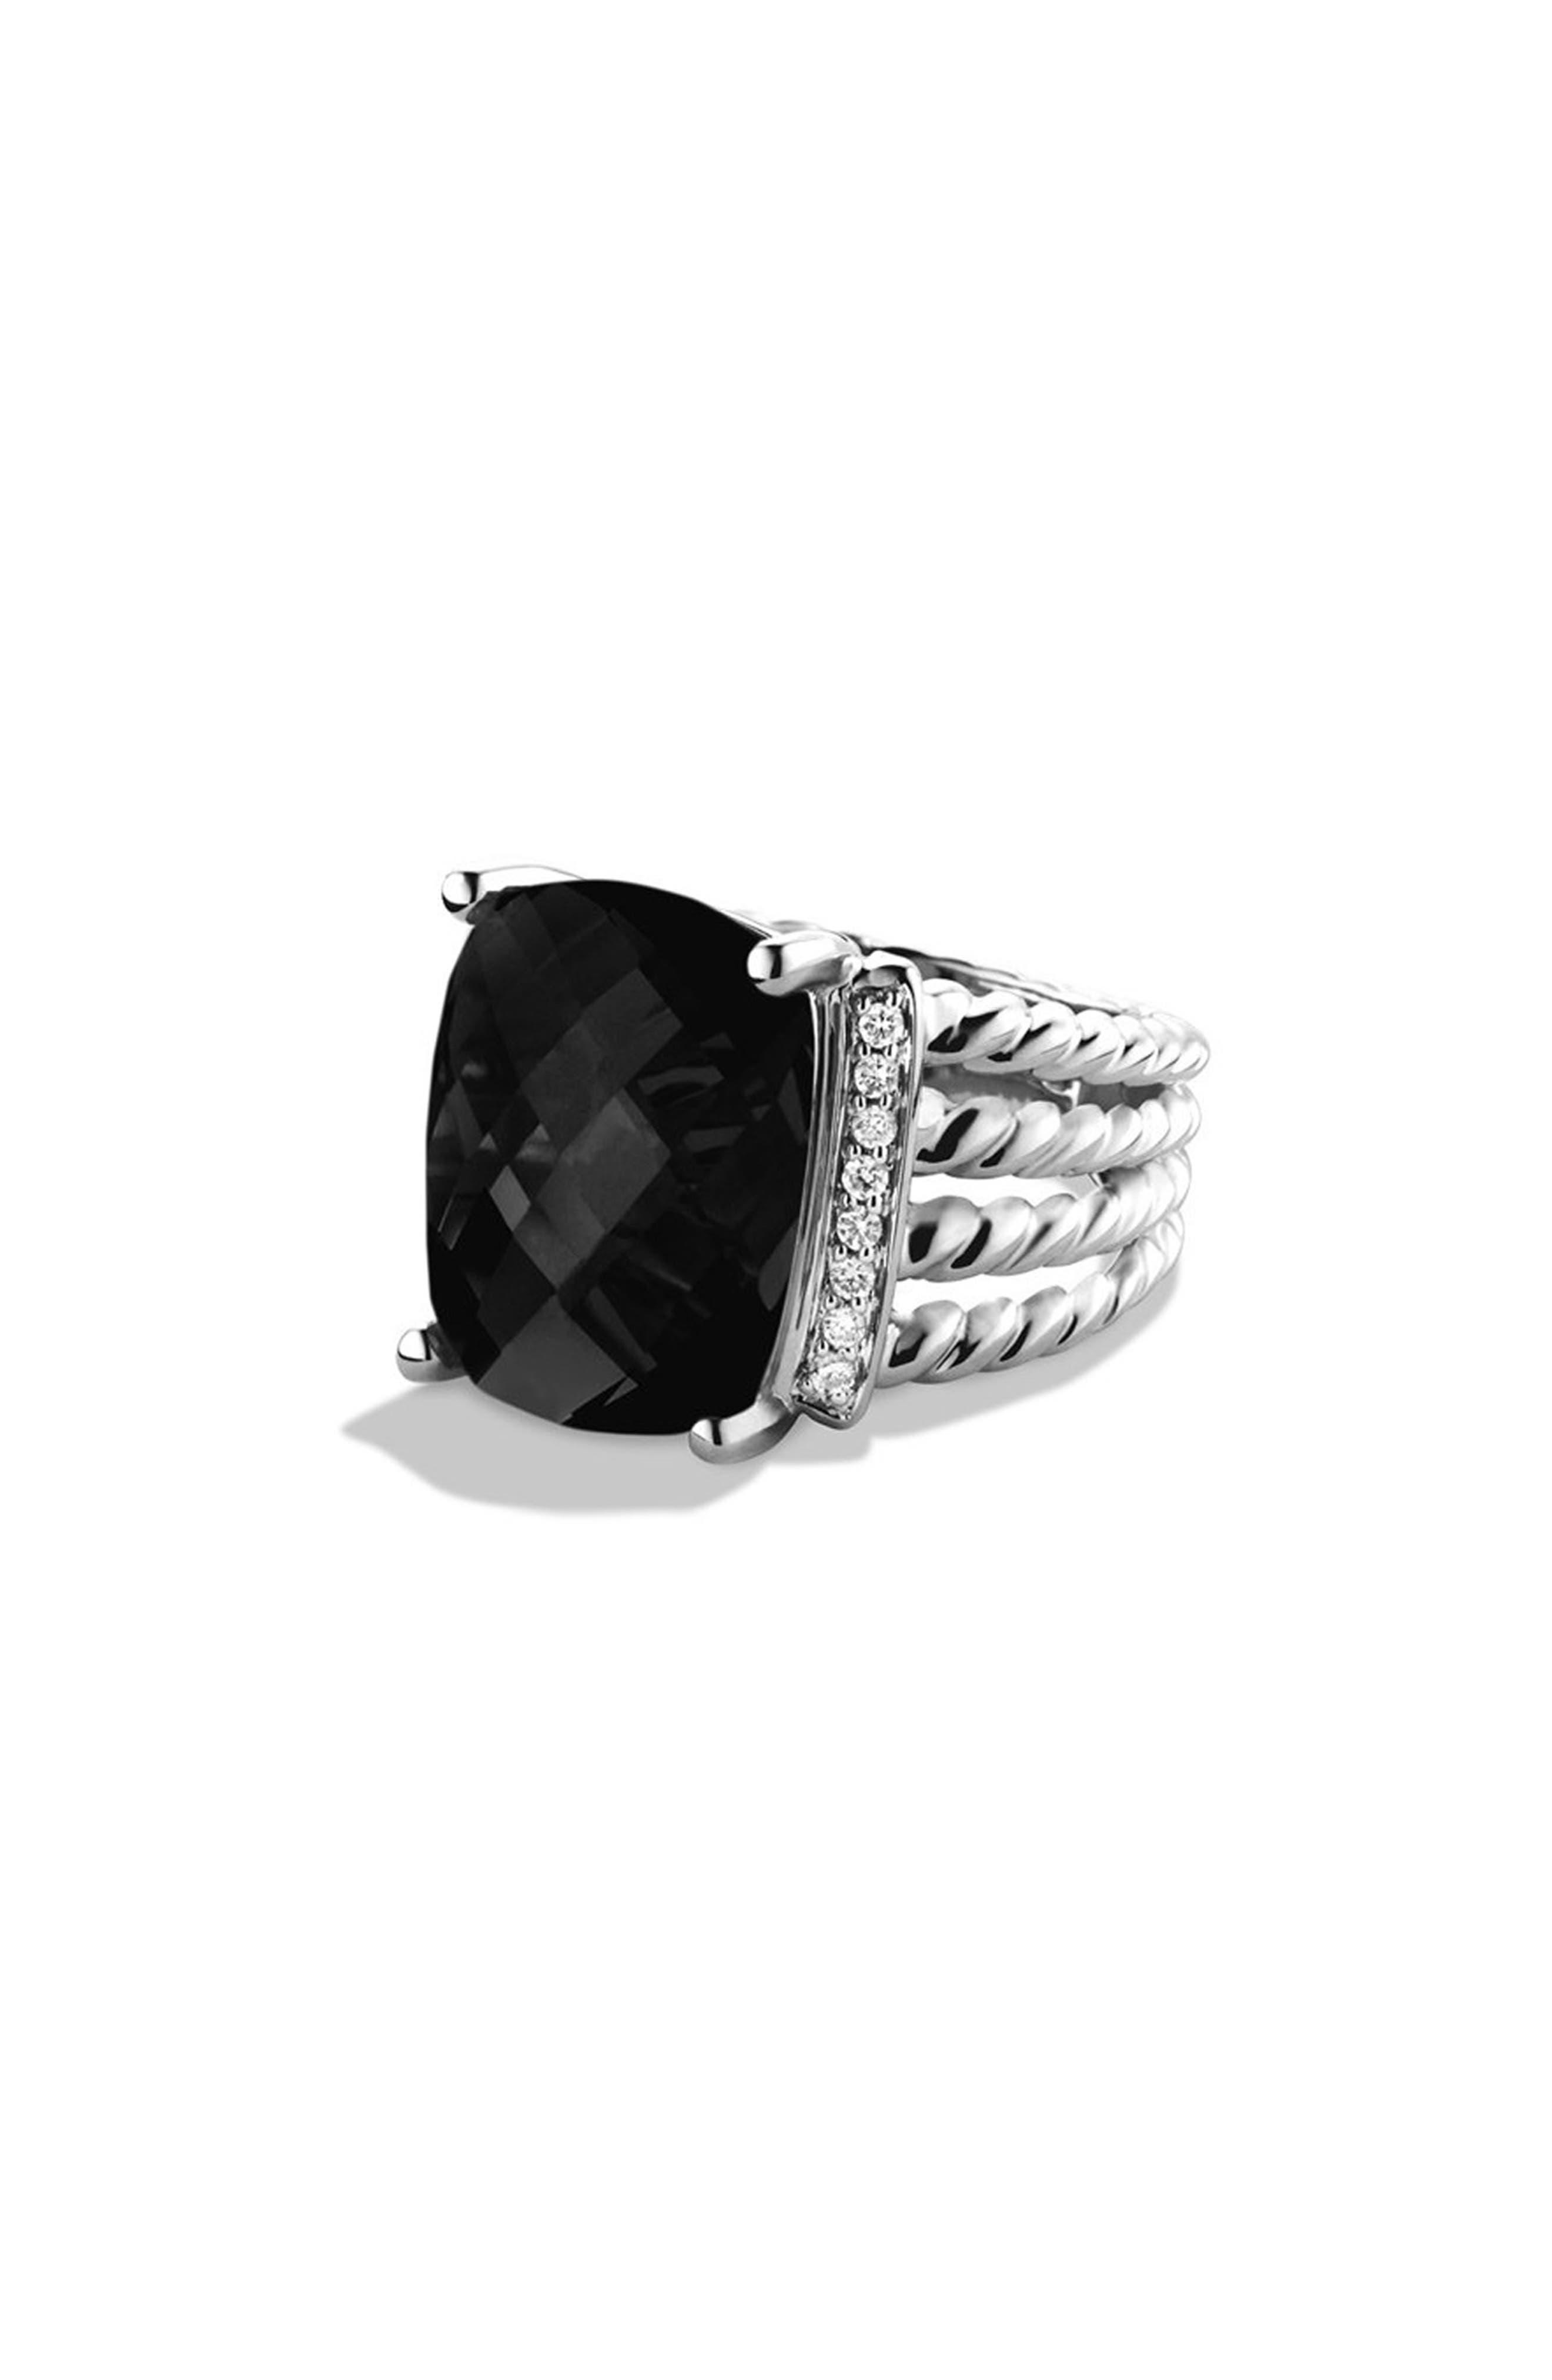 'Wheaton' Ring with Semiprecious Stone & Diamonds,                             Alternate thumbnail 7, color,                             BLACK ONYX